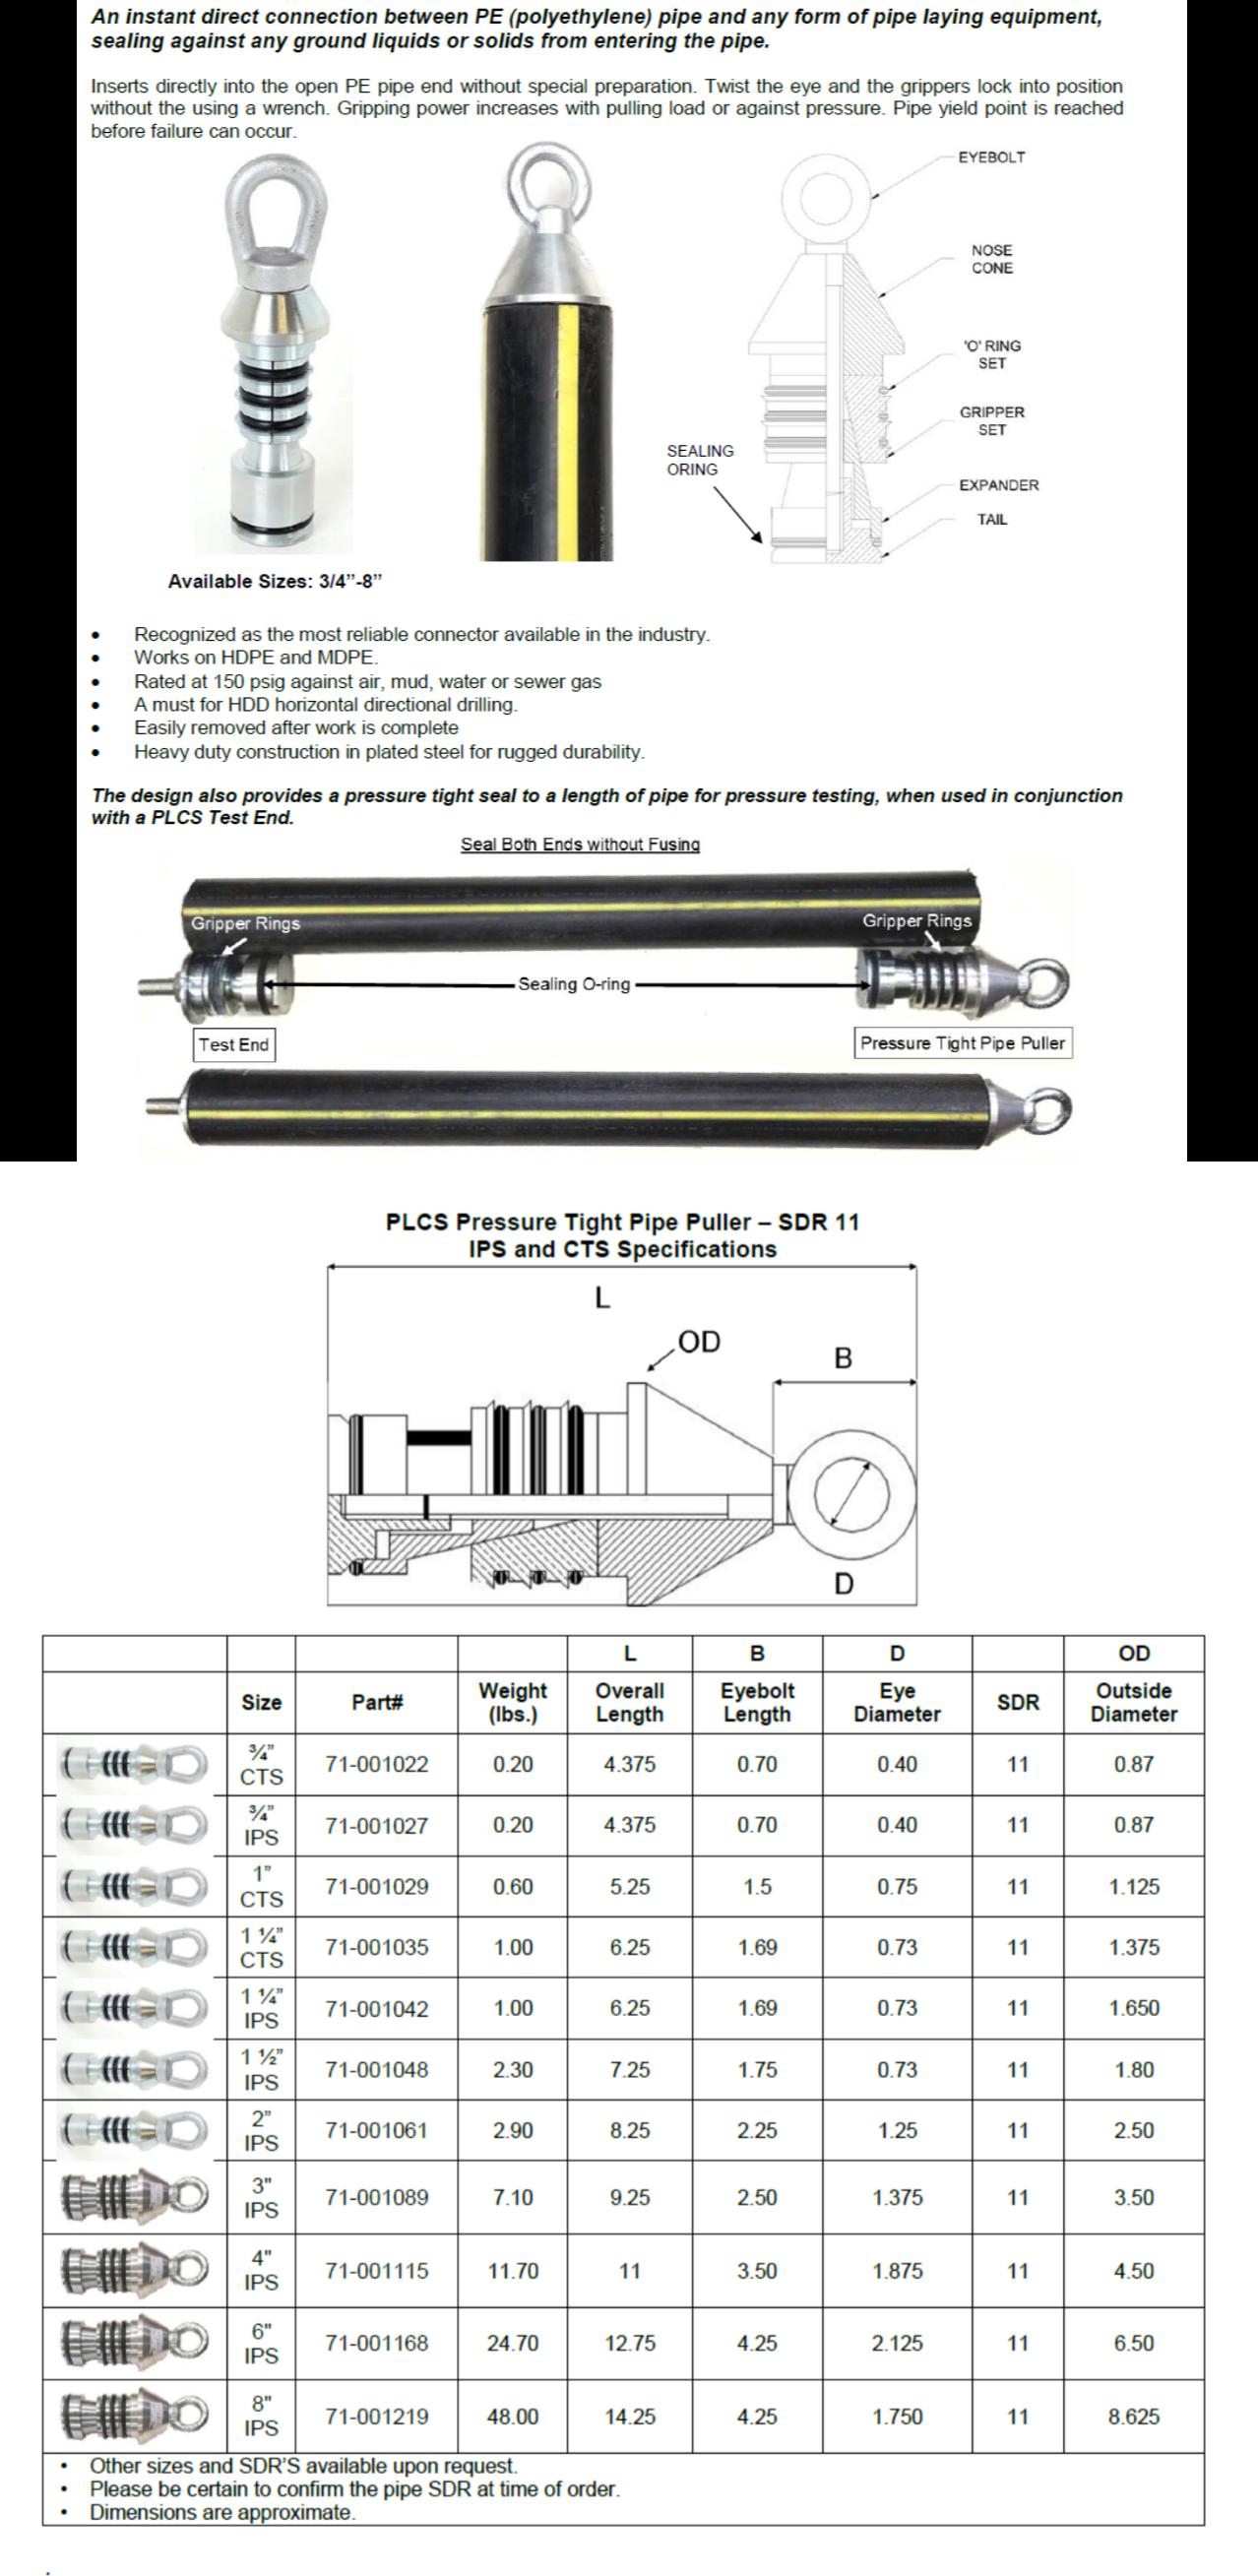 psi-puller-cut-sheet.png